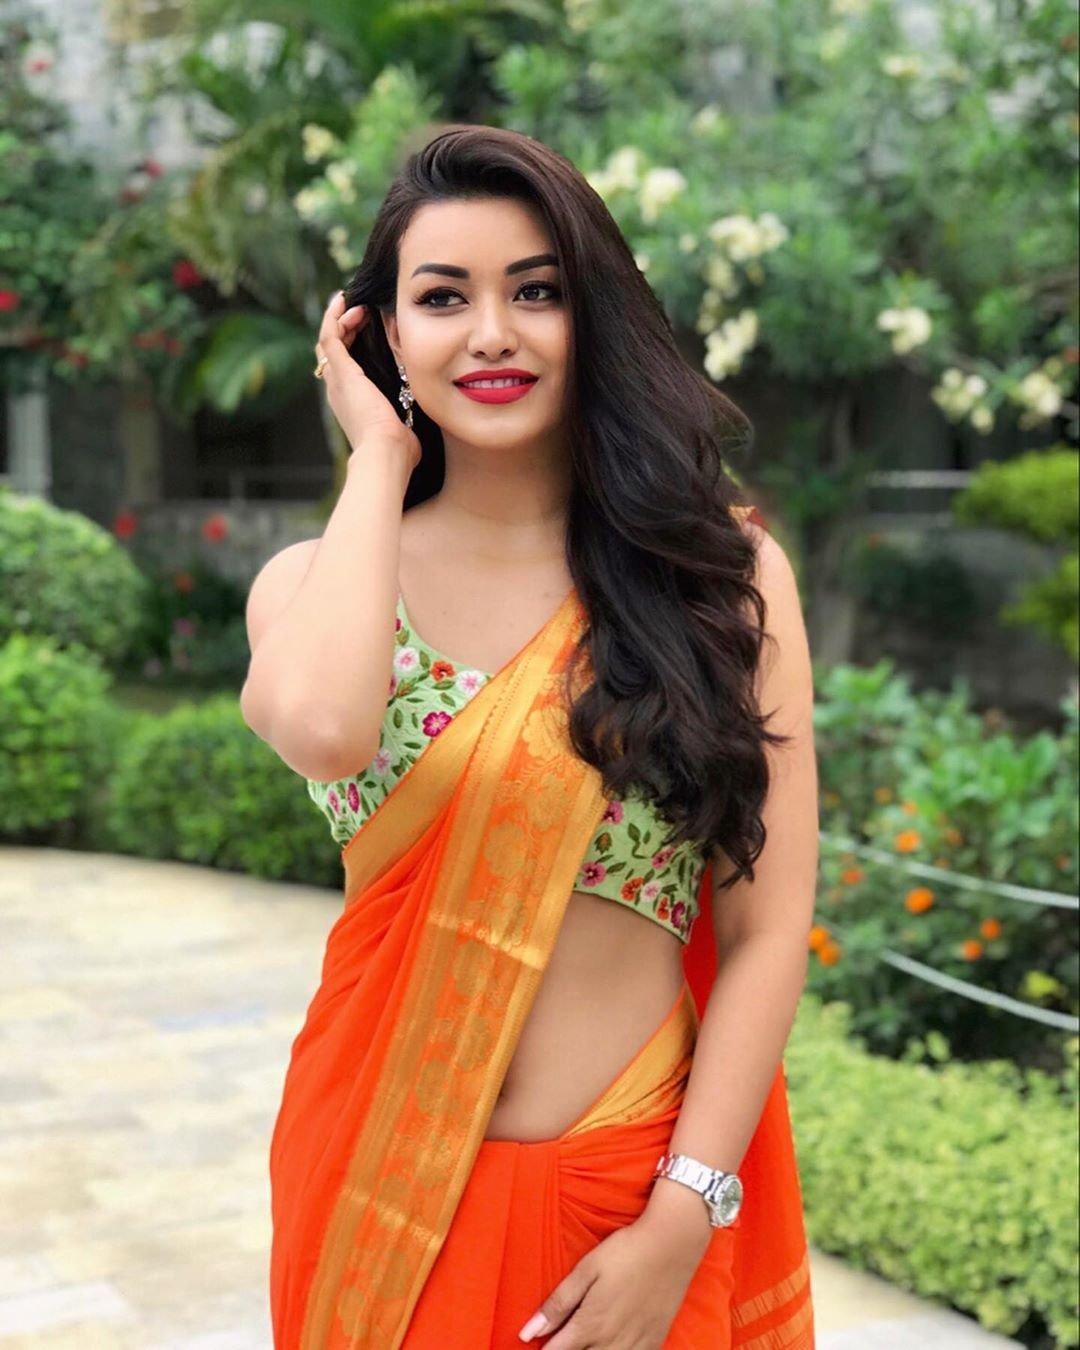 Hot Girl In Saree | Indian Cute Girl In Saree